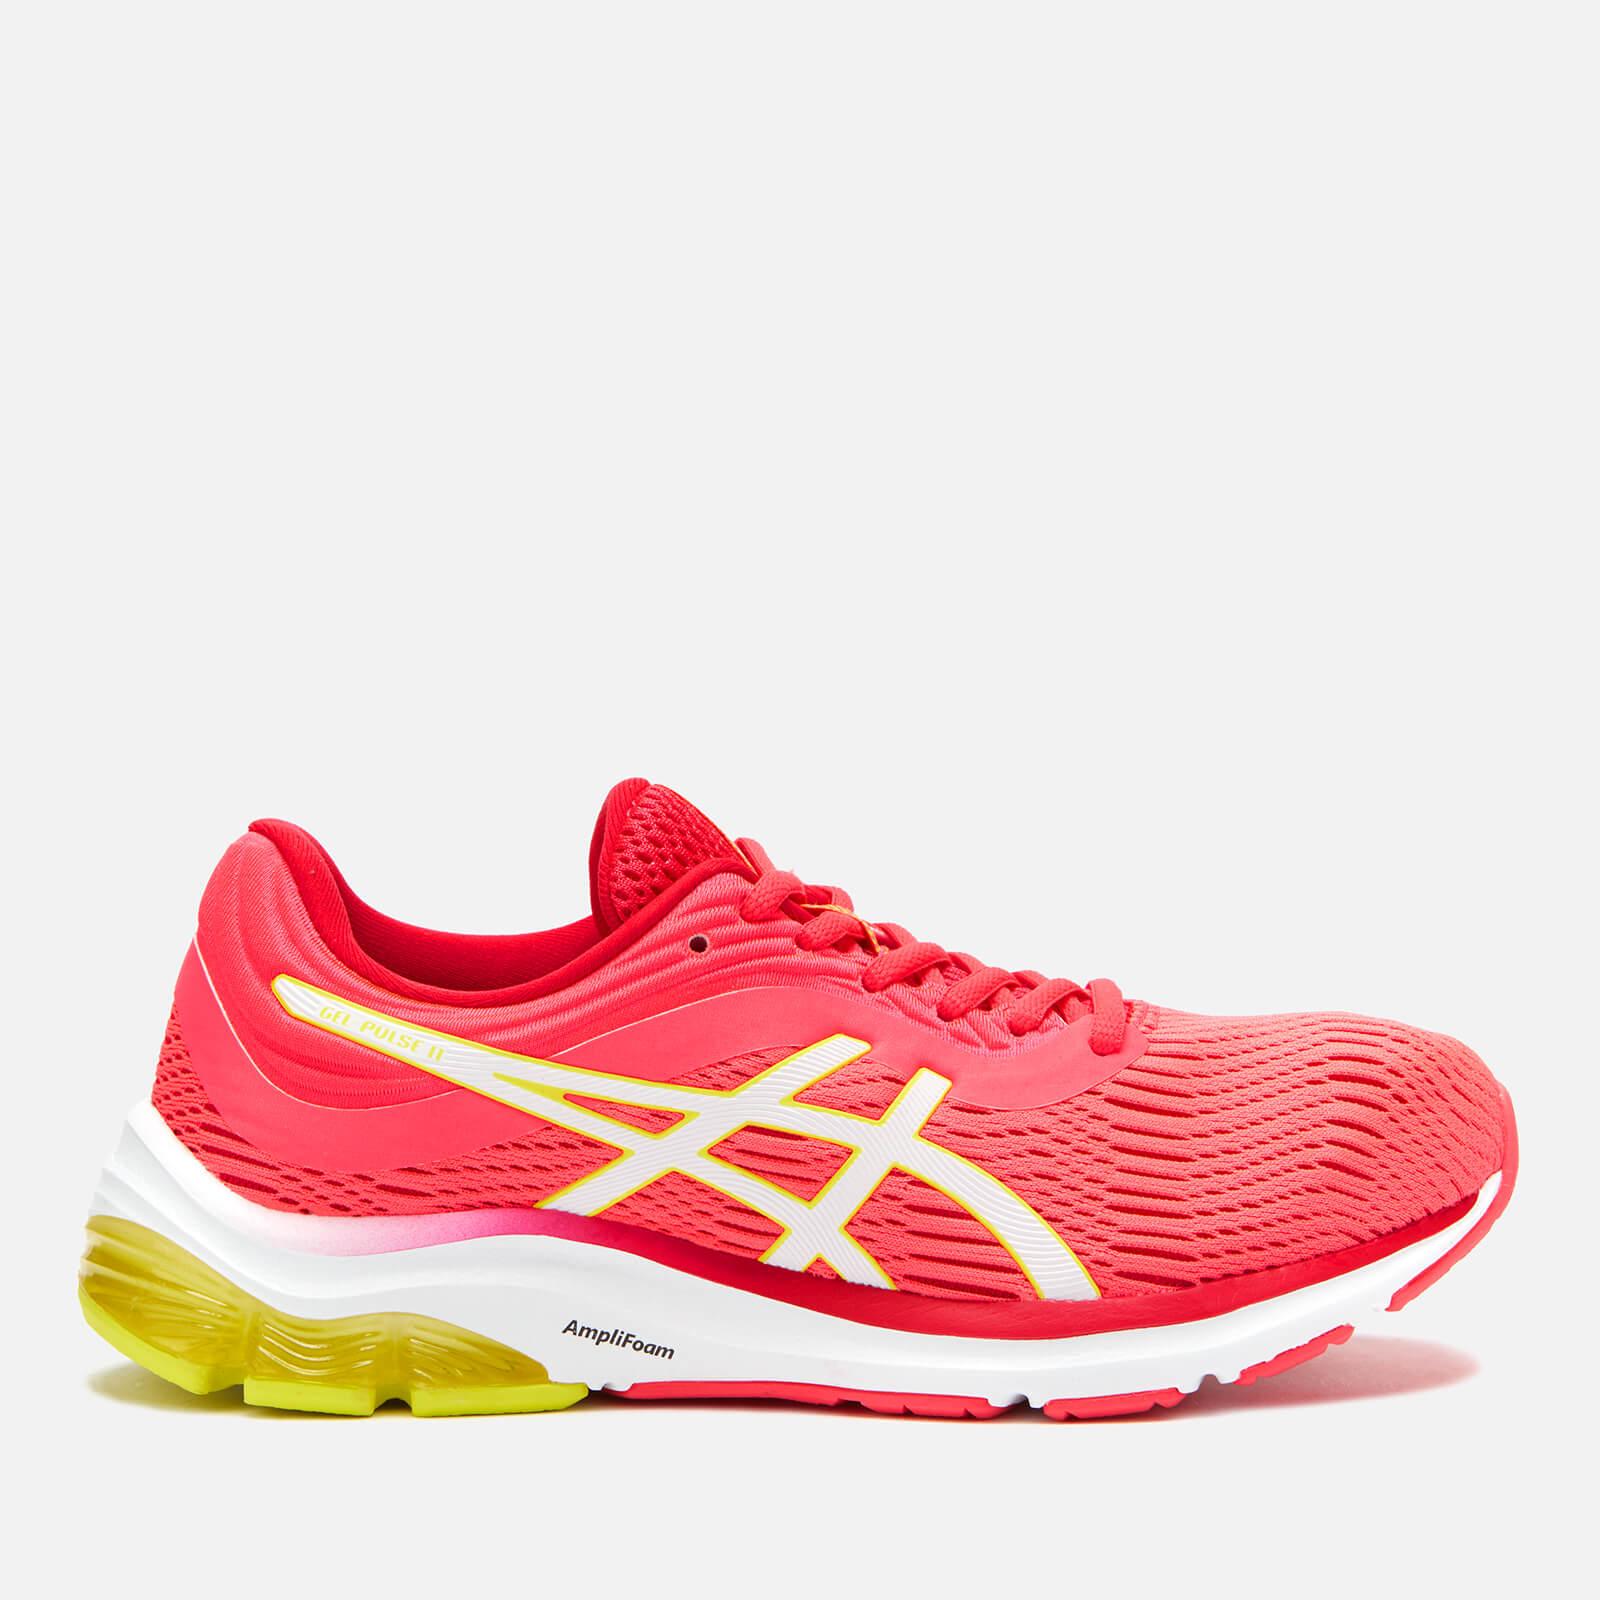 Asics Women's Running Gel-Pulse 11 Trainers - Laser Pink/Sour Yuzu - UK 5 - Pink